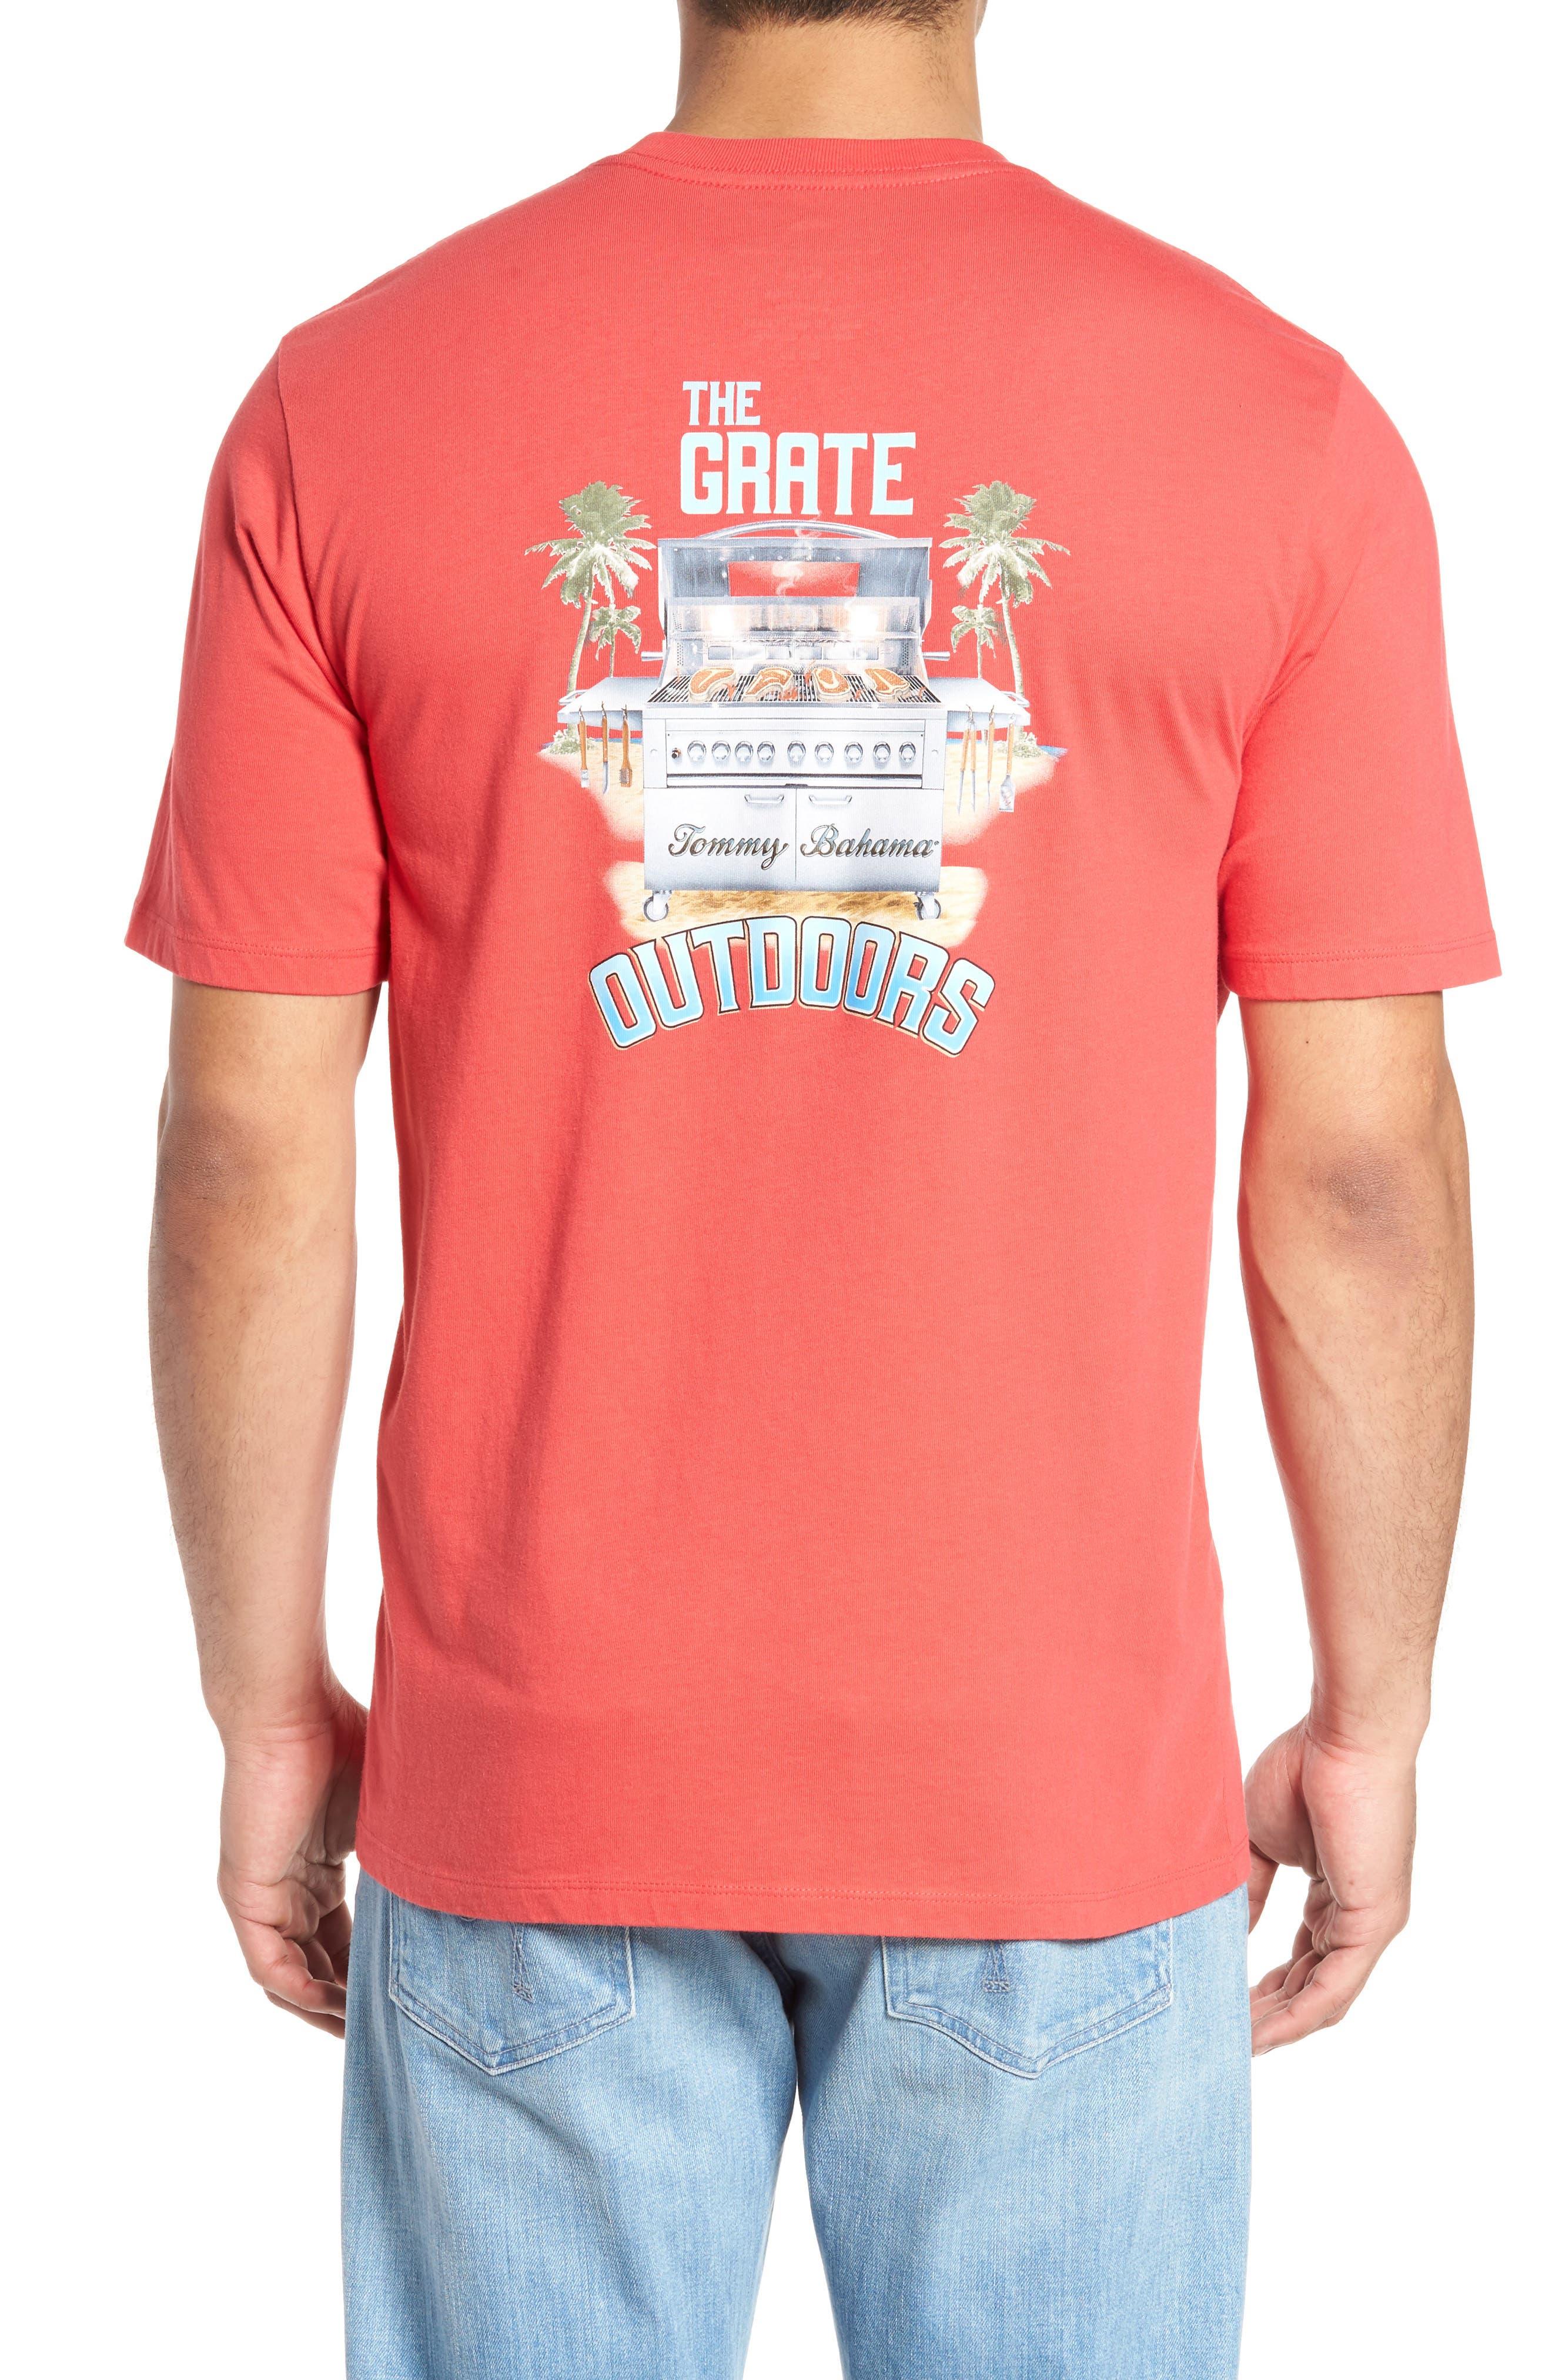 Grate Outdoors T-Shirt,                             Alternate thumbnail 2, color,                             Pomodoro